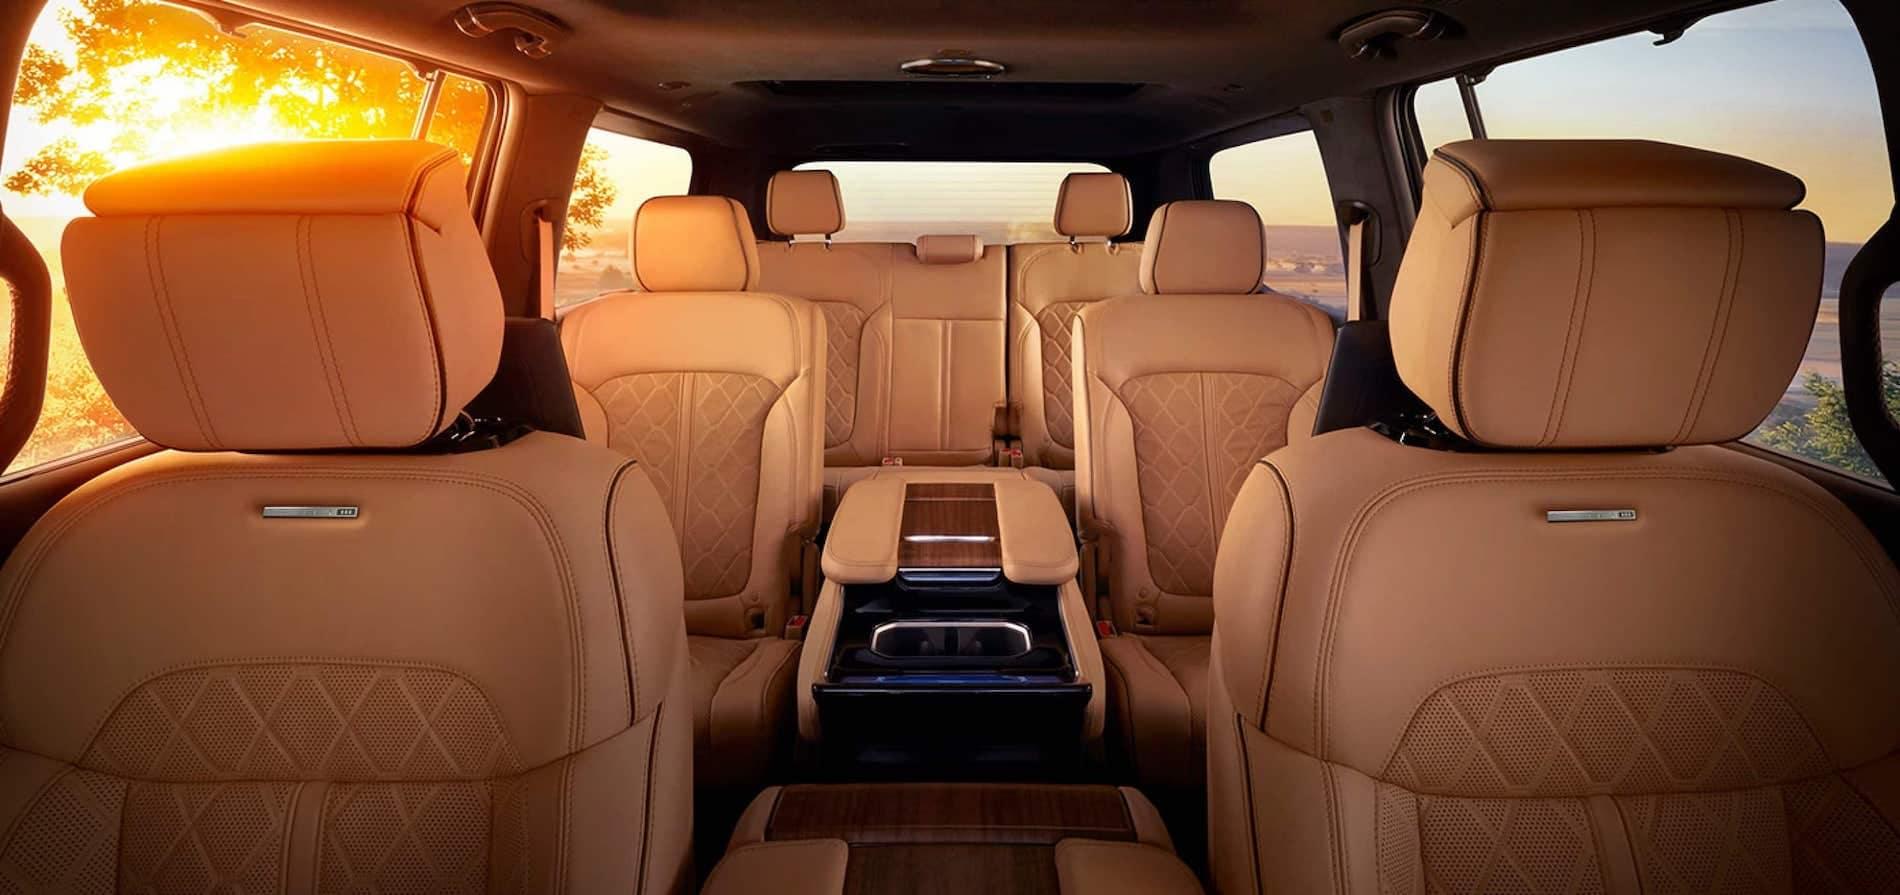 Grand Wagoneer Leather Interior